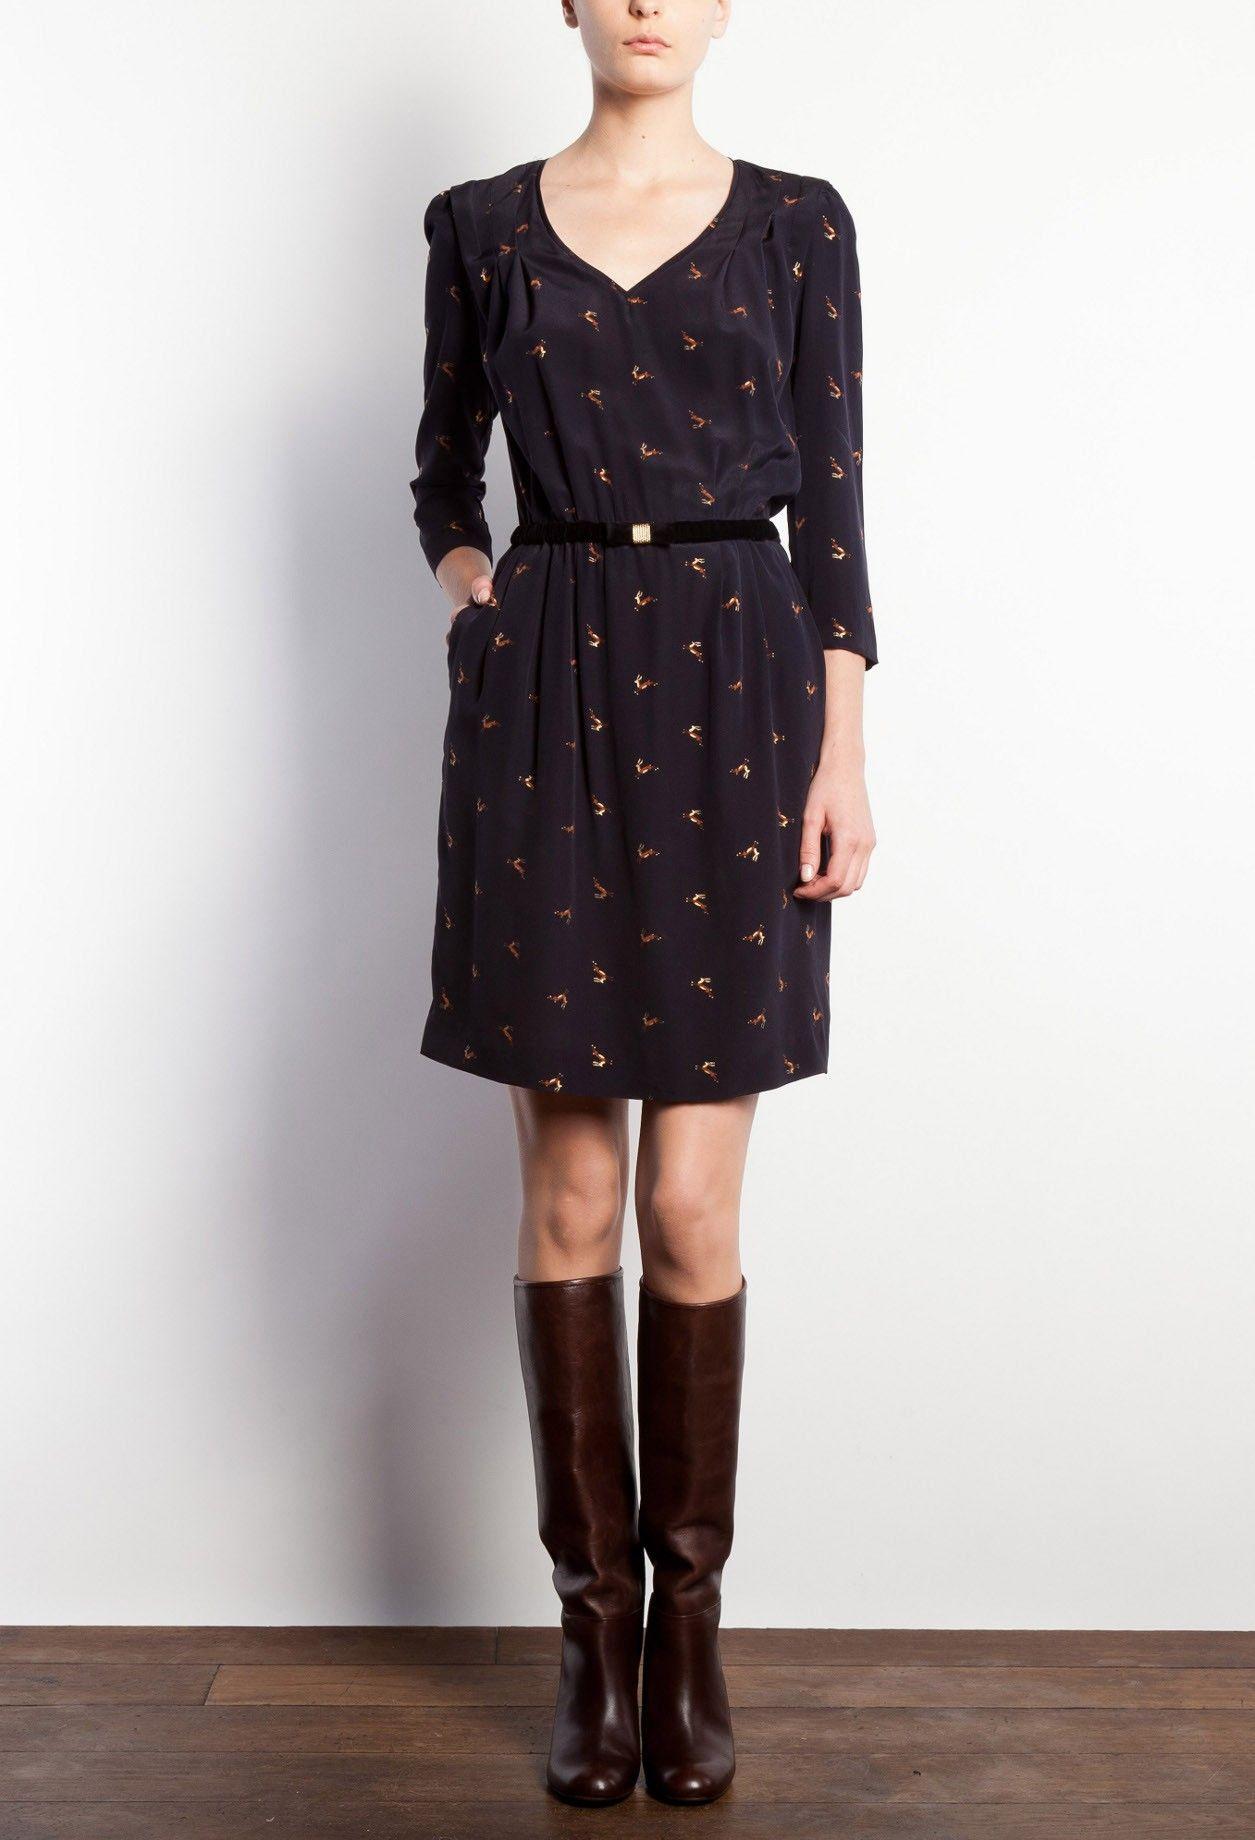 e96eeb0fa5841 Claudie Pierlot - Eshop Officiel en 2019   Shopping   Robe ...